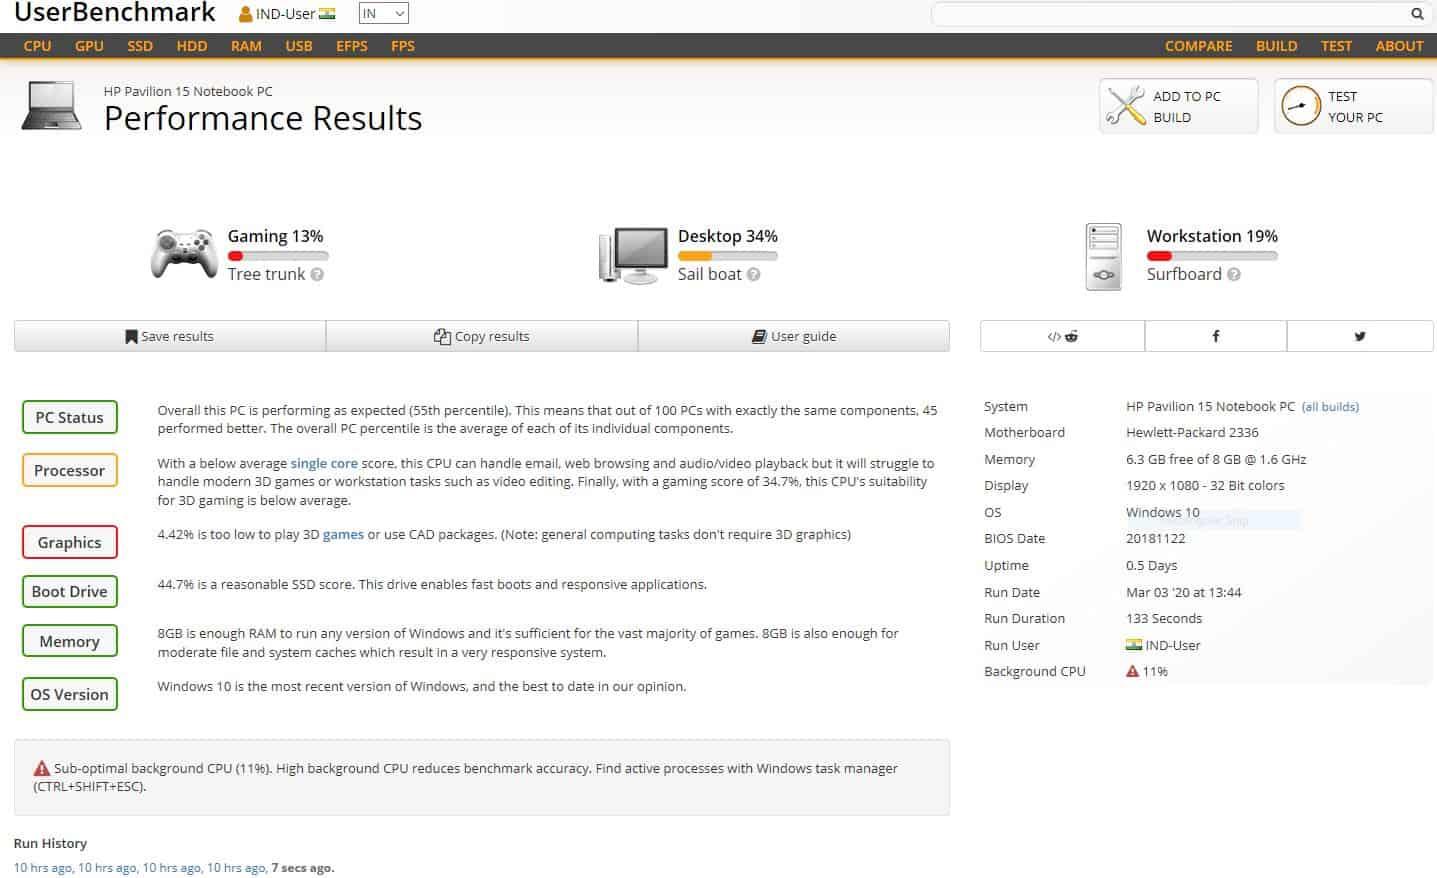 UserBenchmark is a freeware benchmarking tool